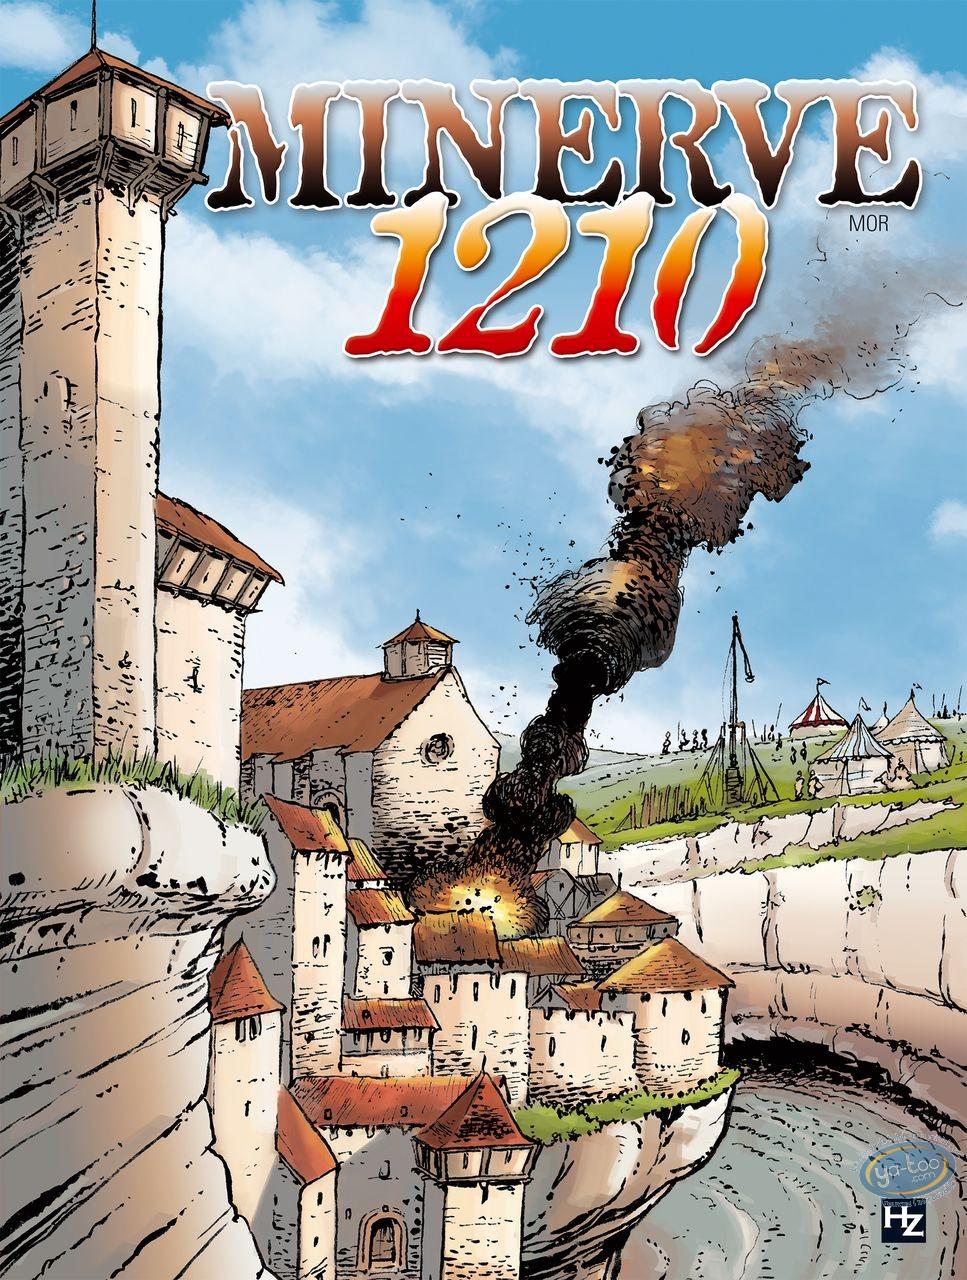 European Comic Books, Epopée Cathare (L') : Minerve 1210 - The Cathar epic